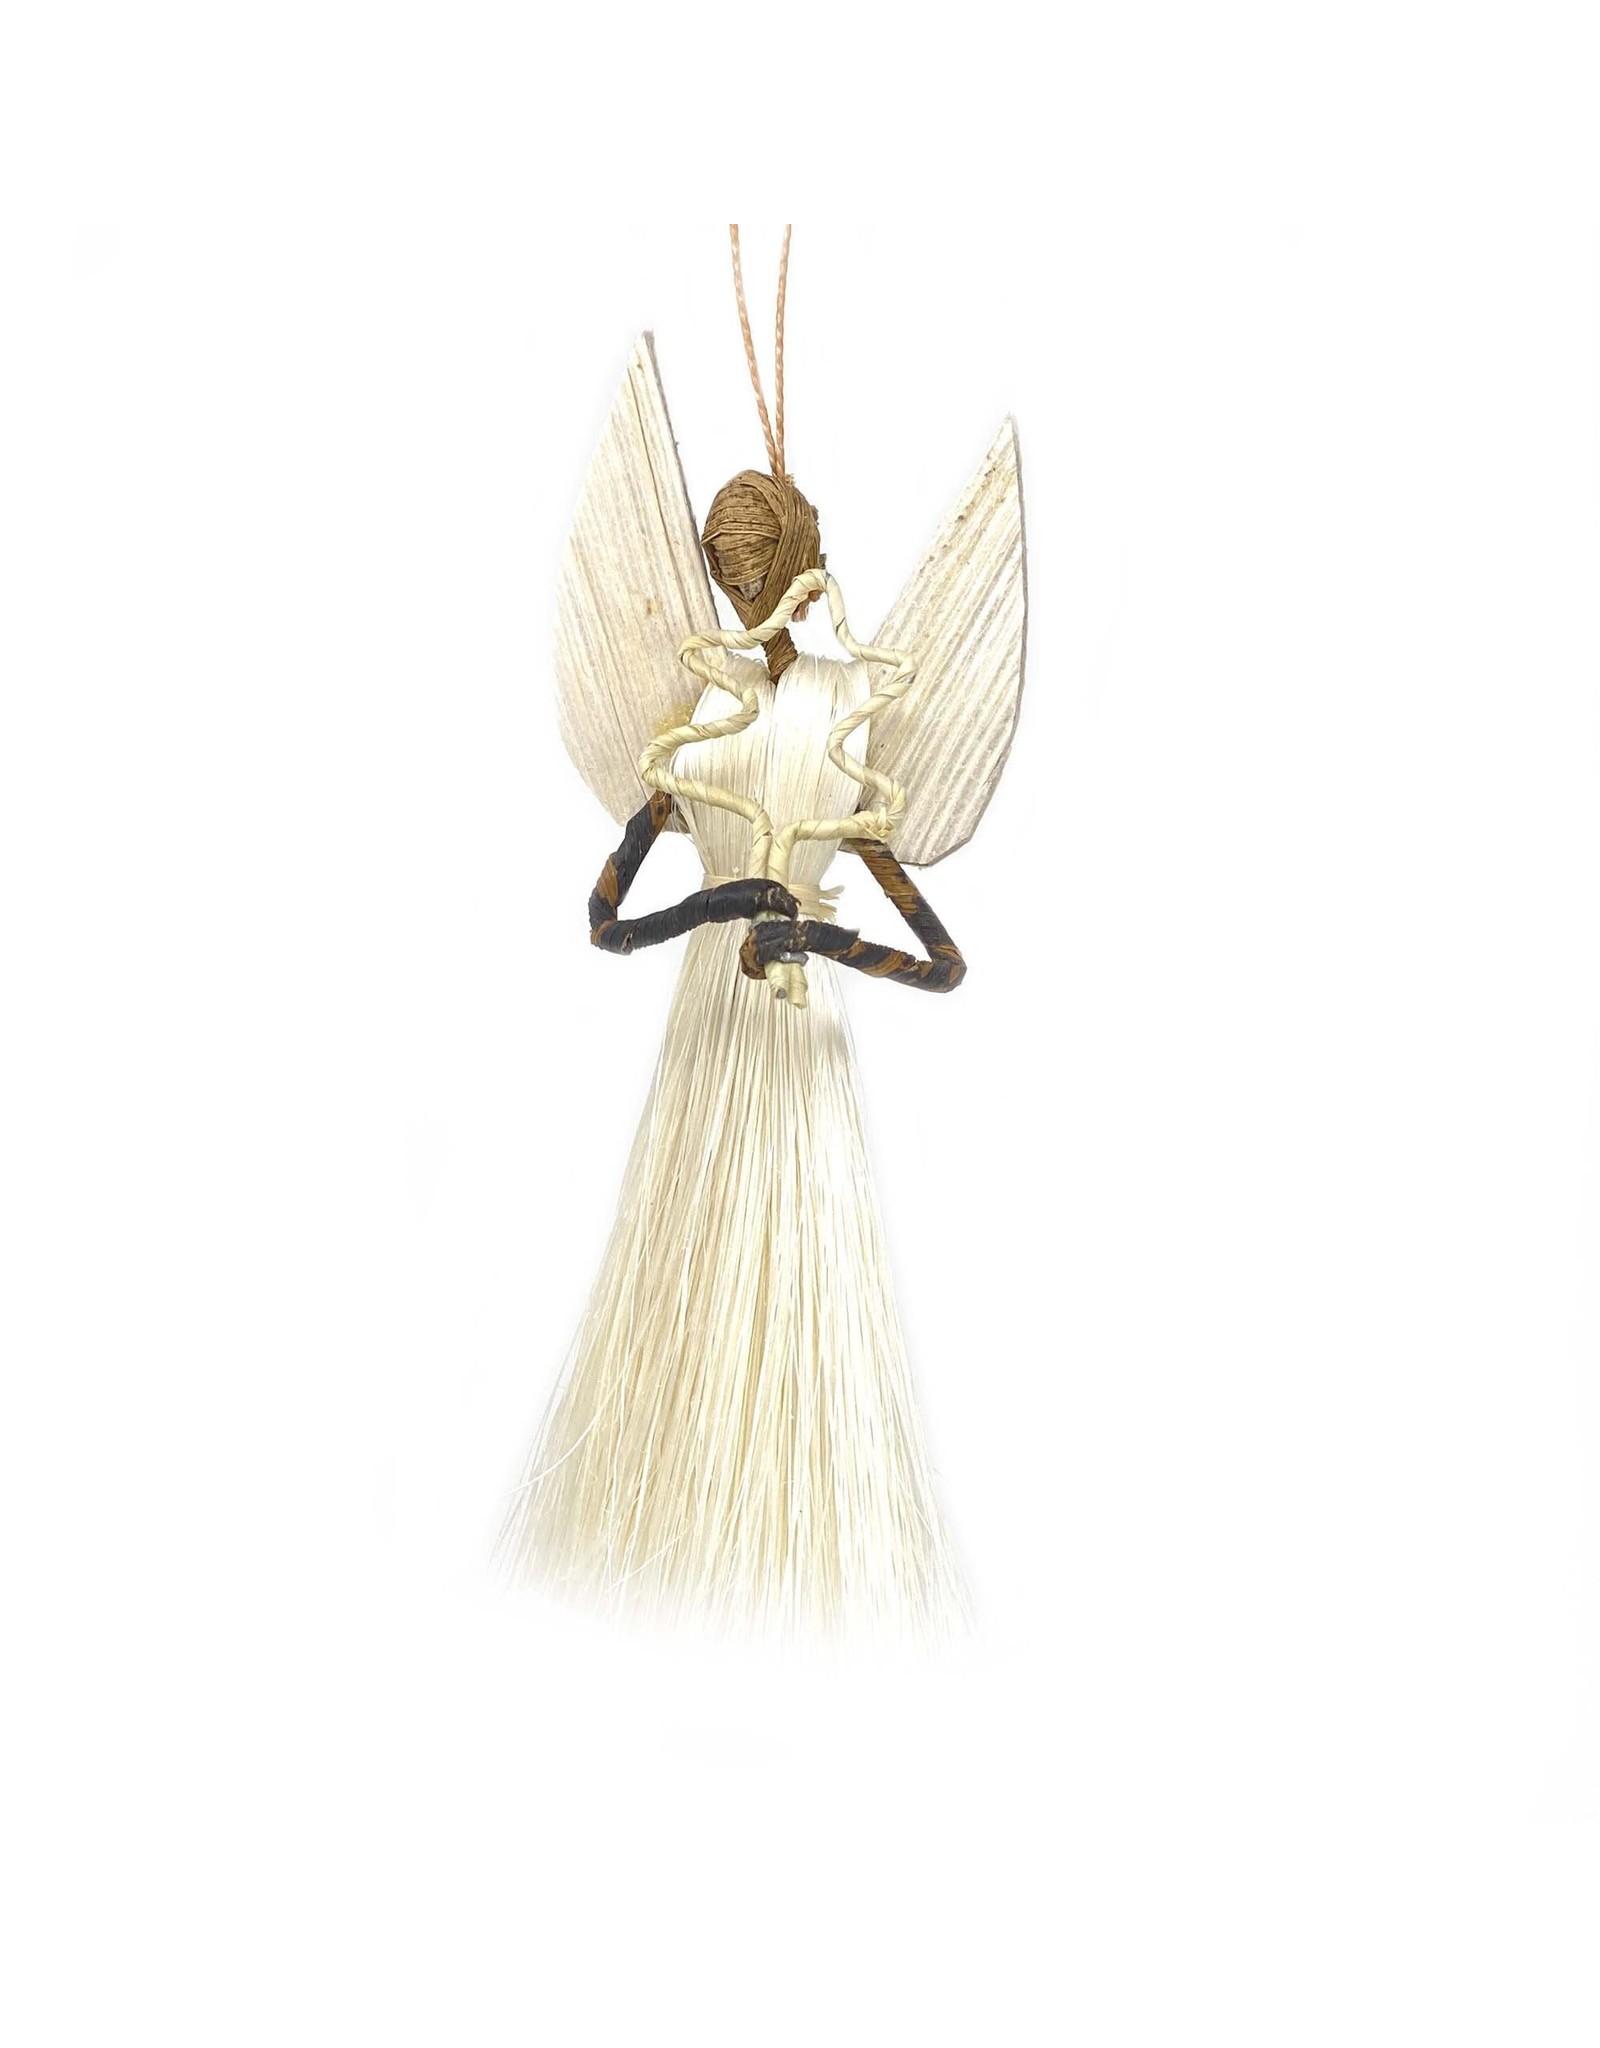 Global Crafts Sisal Angel Ornament, Kenya